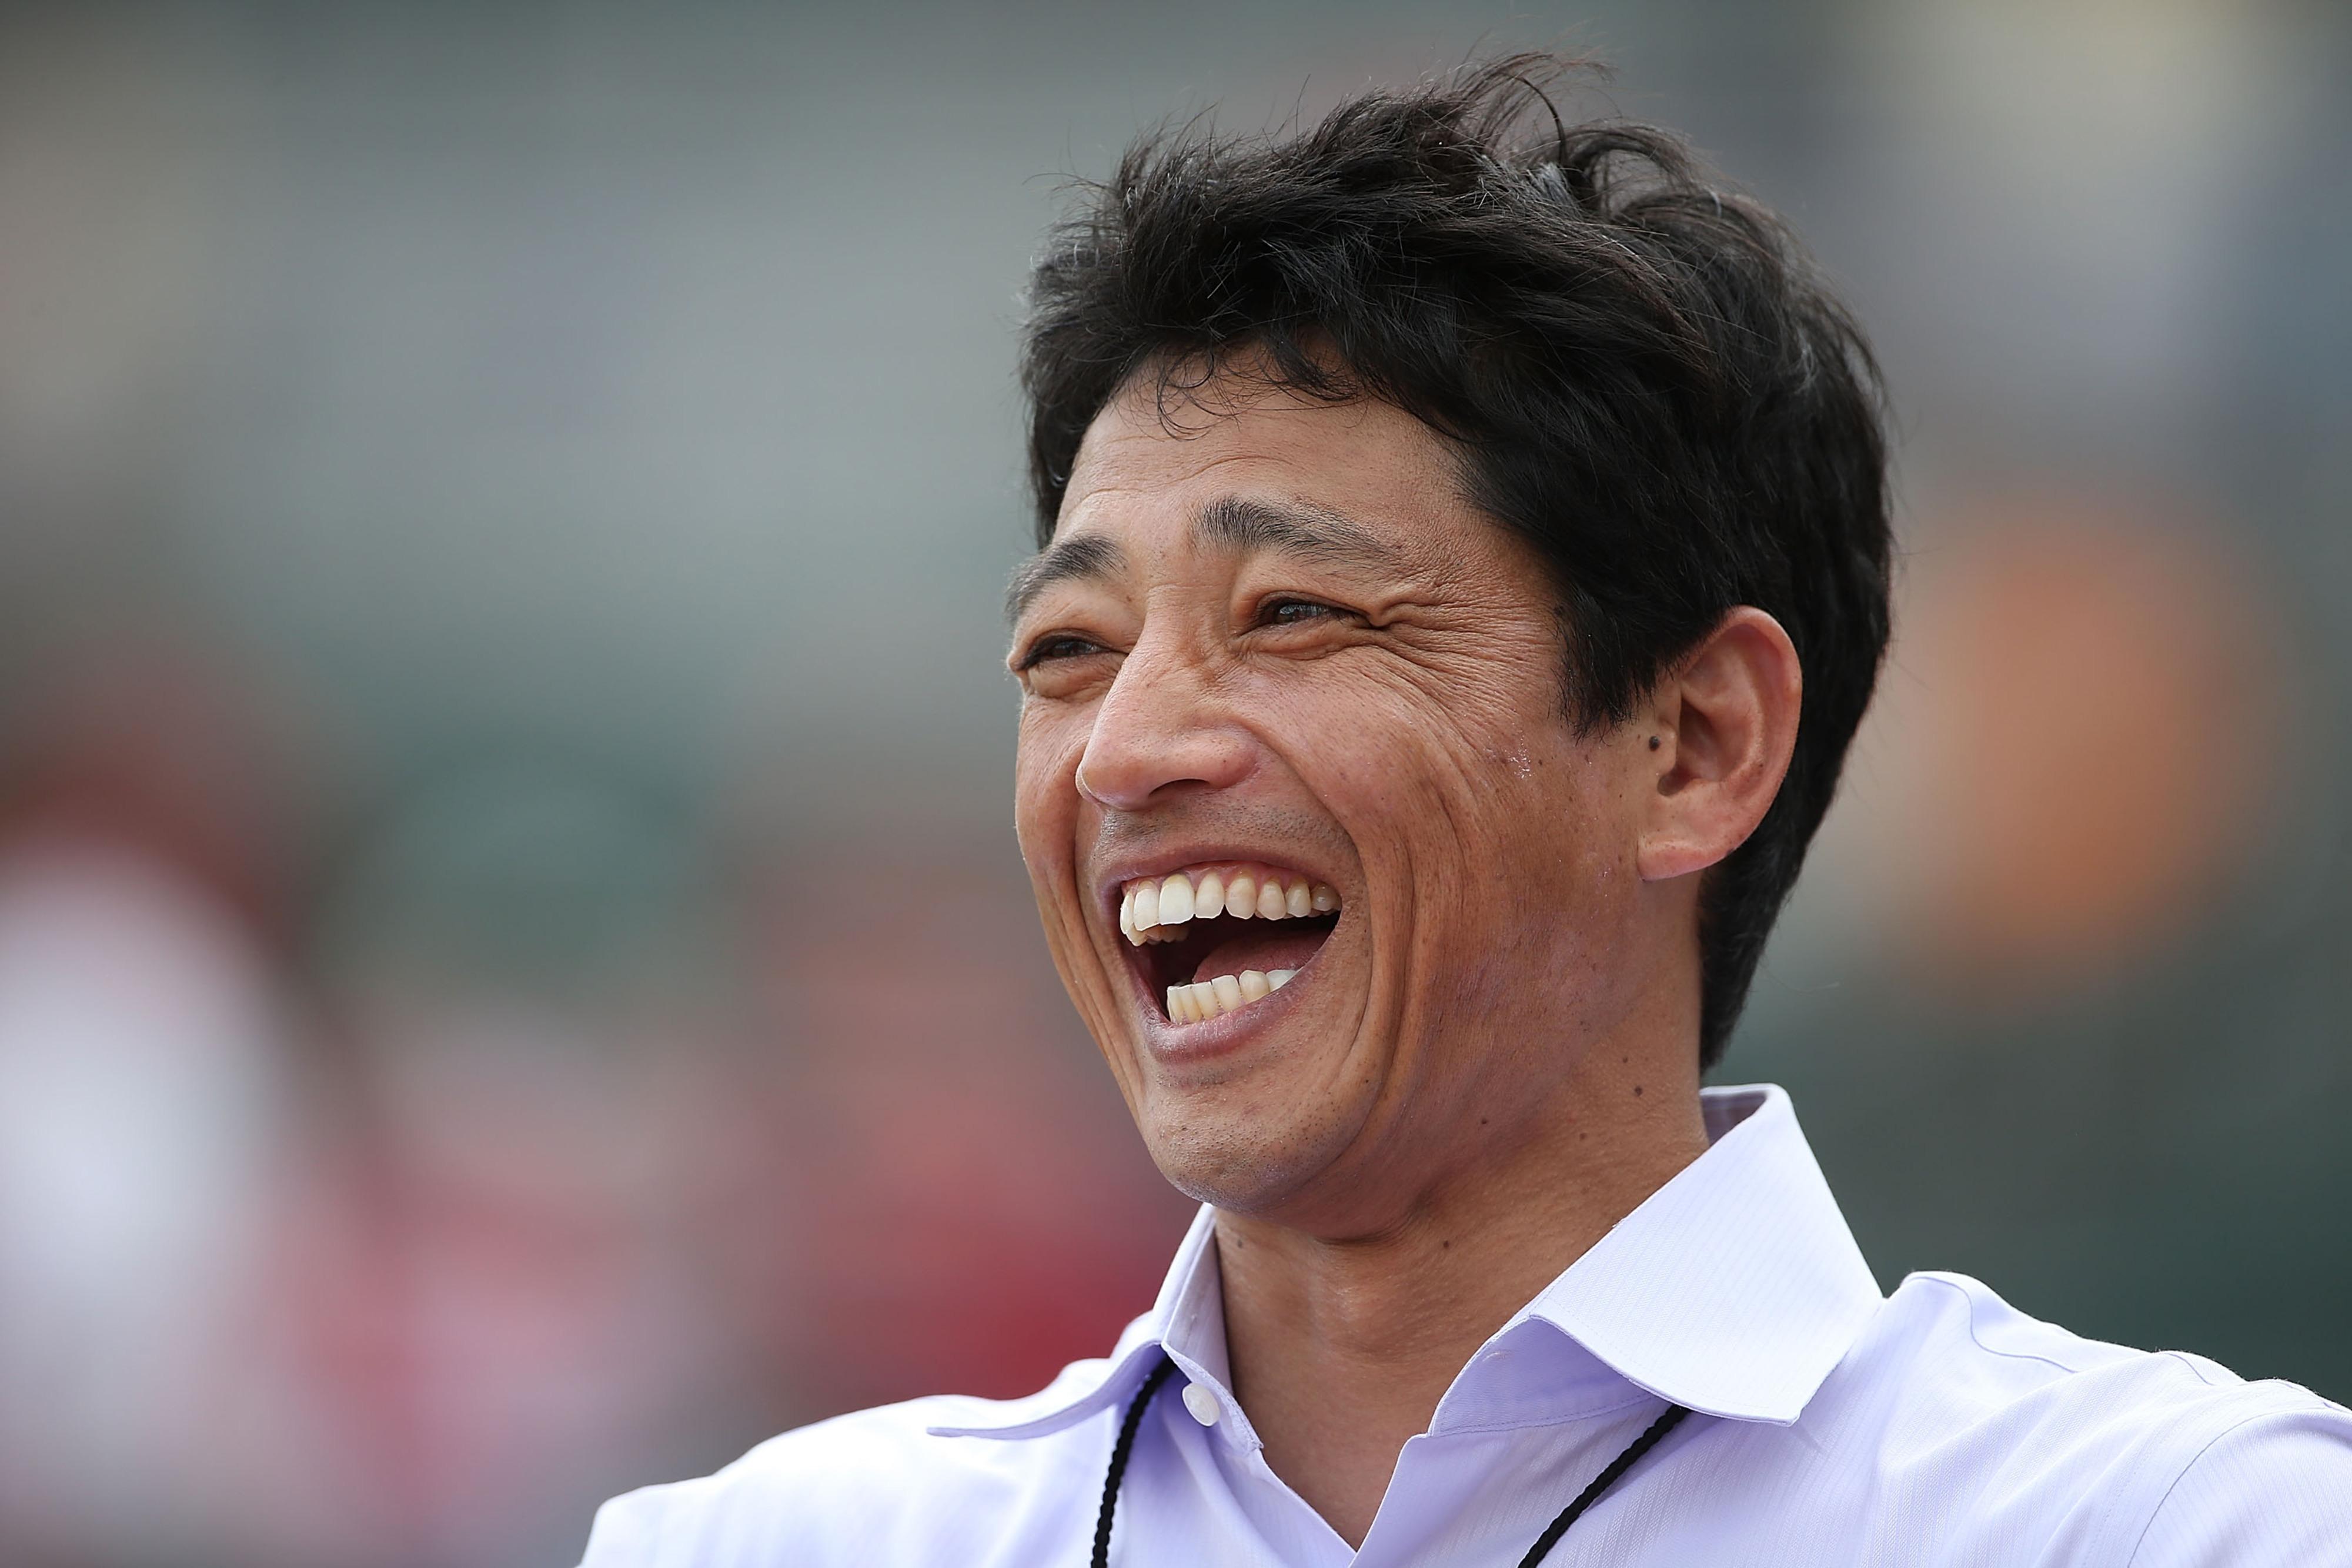 Just So Taguchi in a super-great mood.